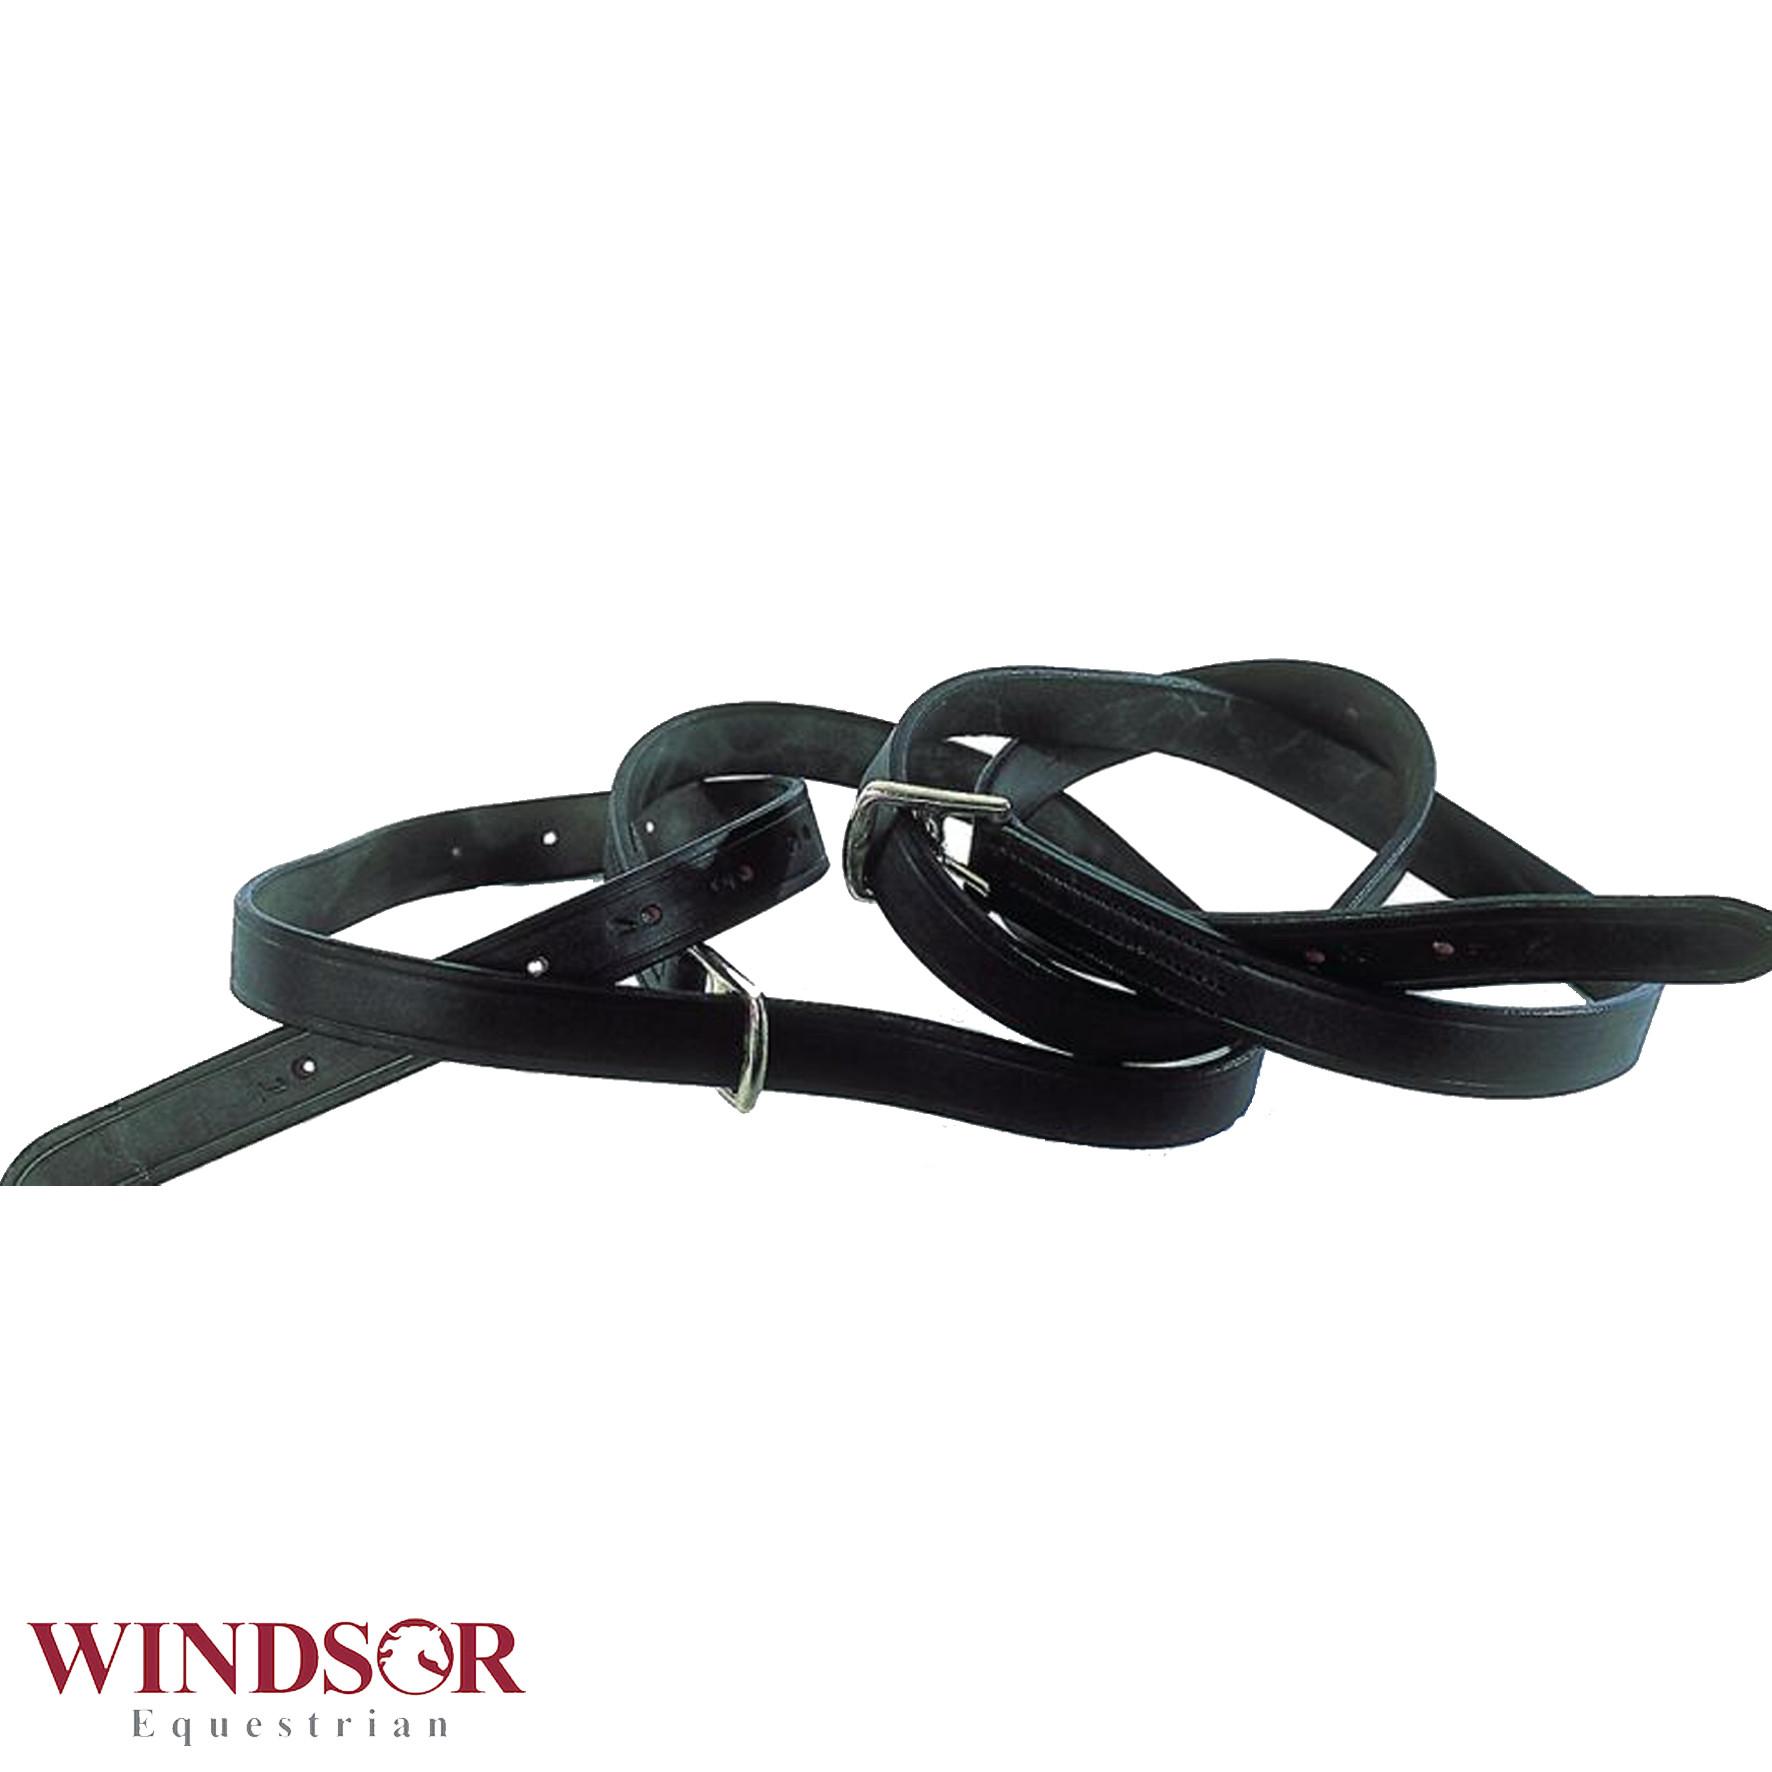 Windsor Equestrian Adult Stirrup Leathers